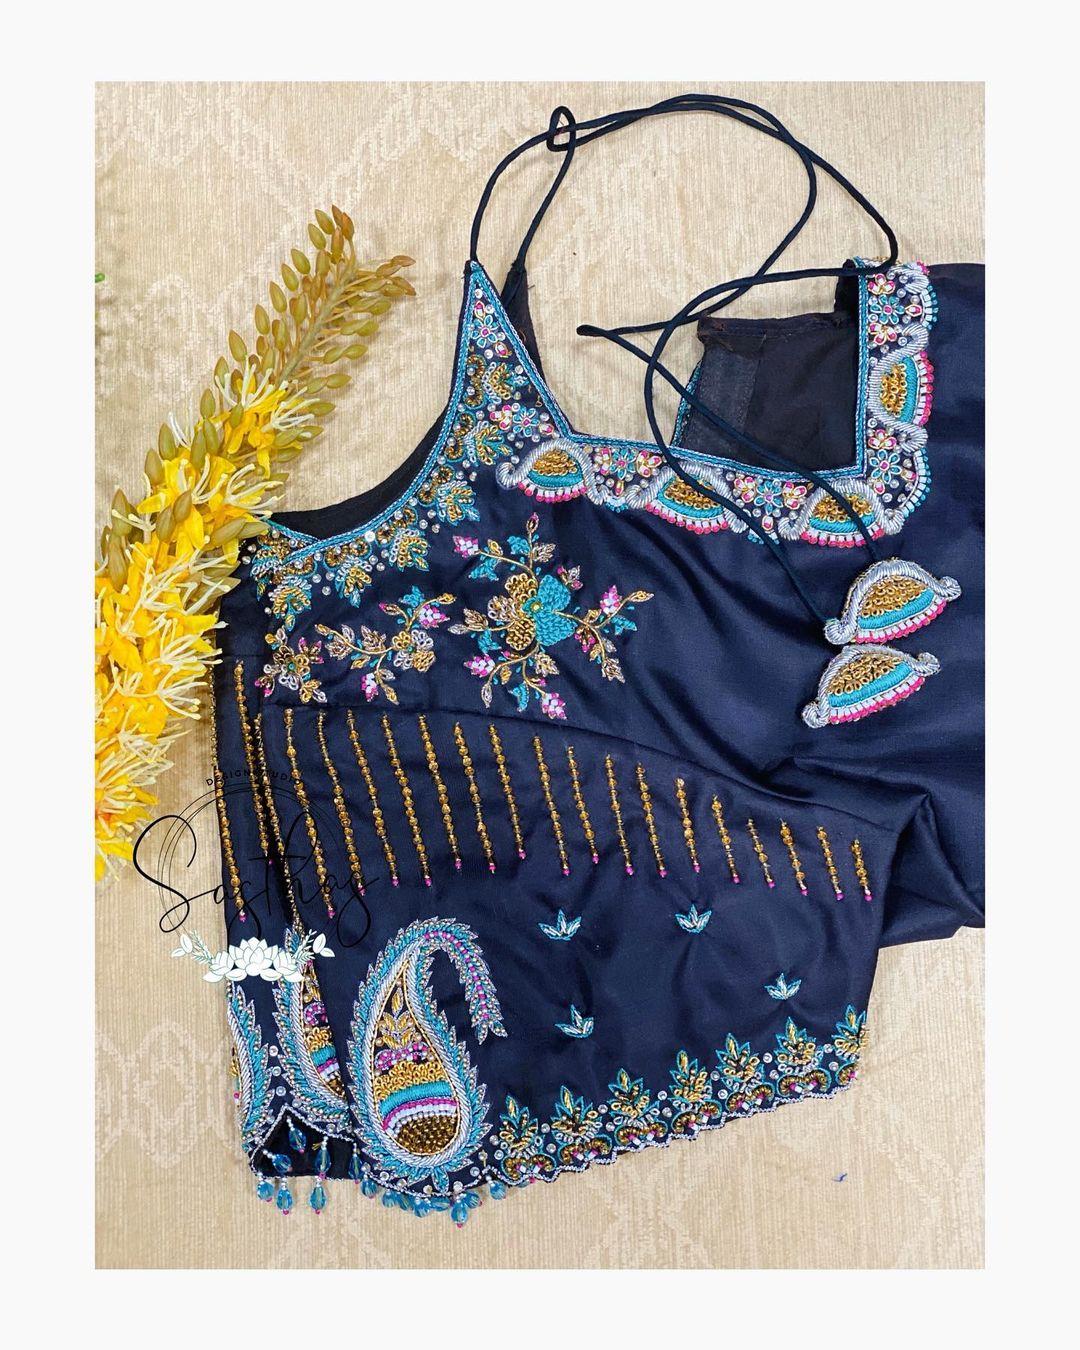 Gorgeous eggplant color designer bridal blouse with floral design multi color thread aari work. 2021-01-26